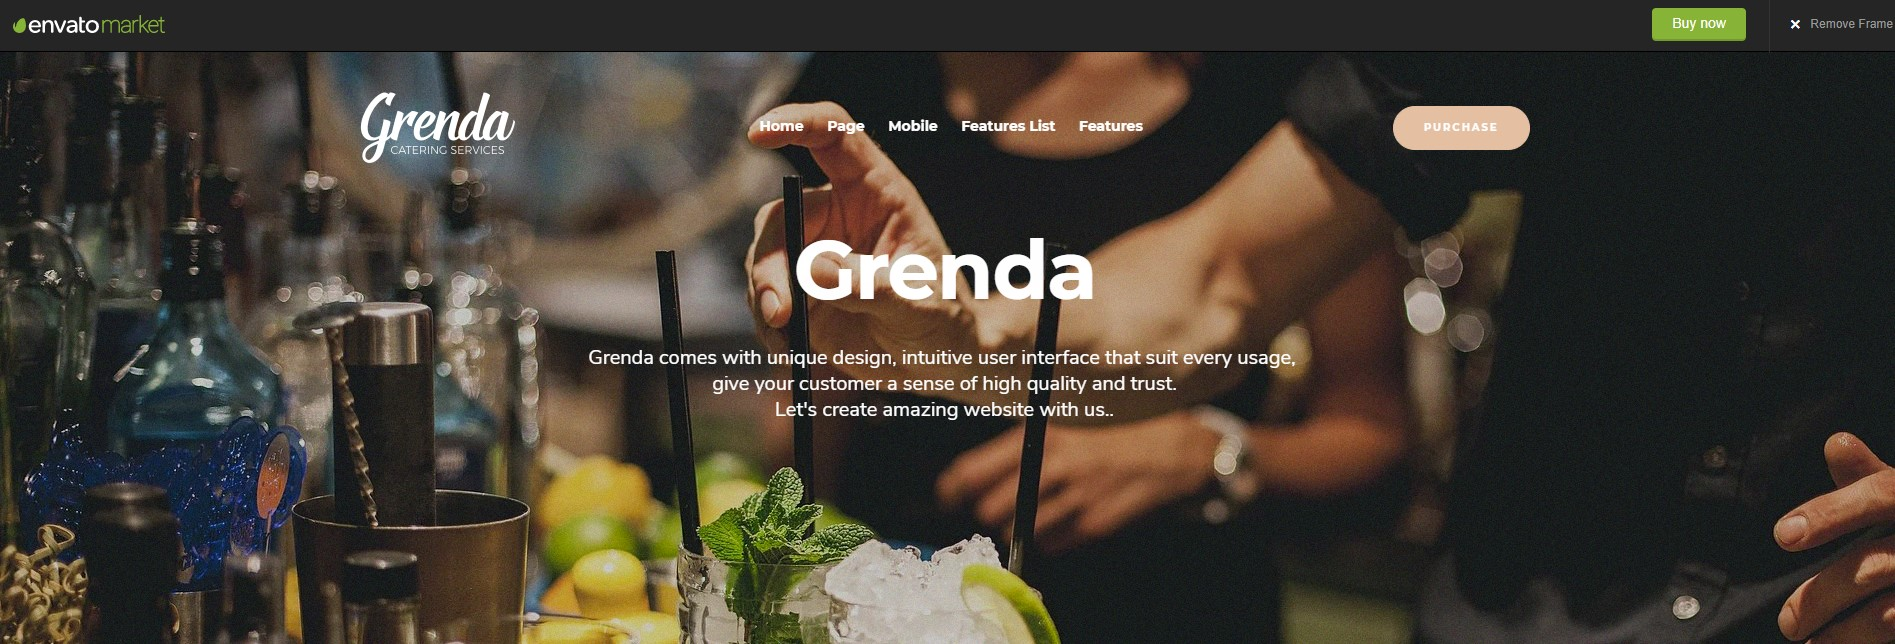 Grenda Event Planner WordPress Theme